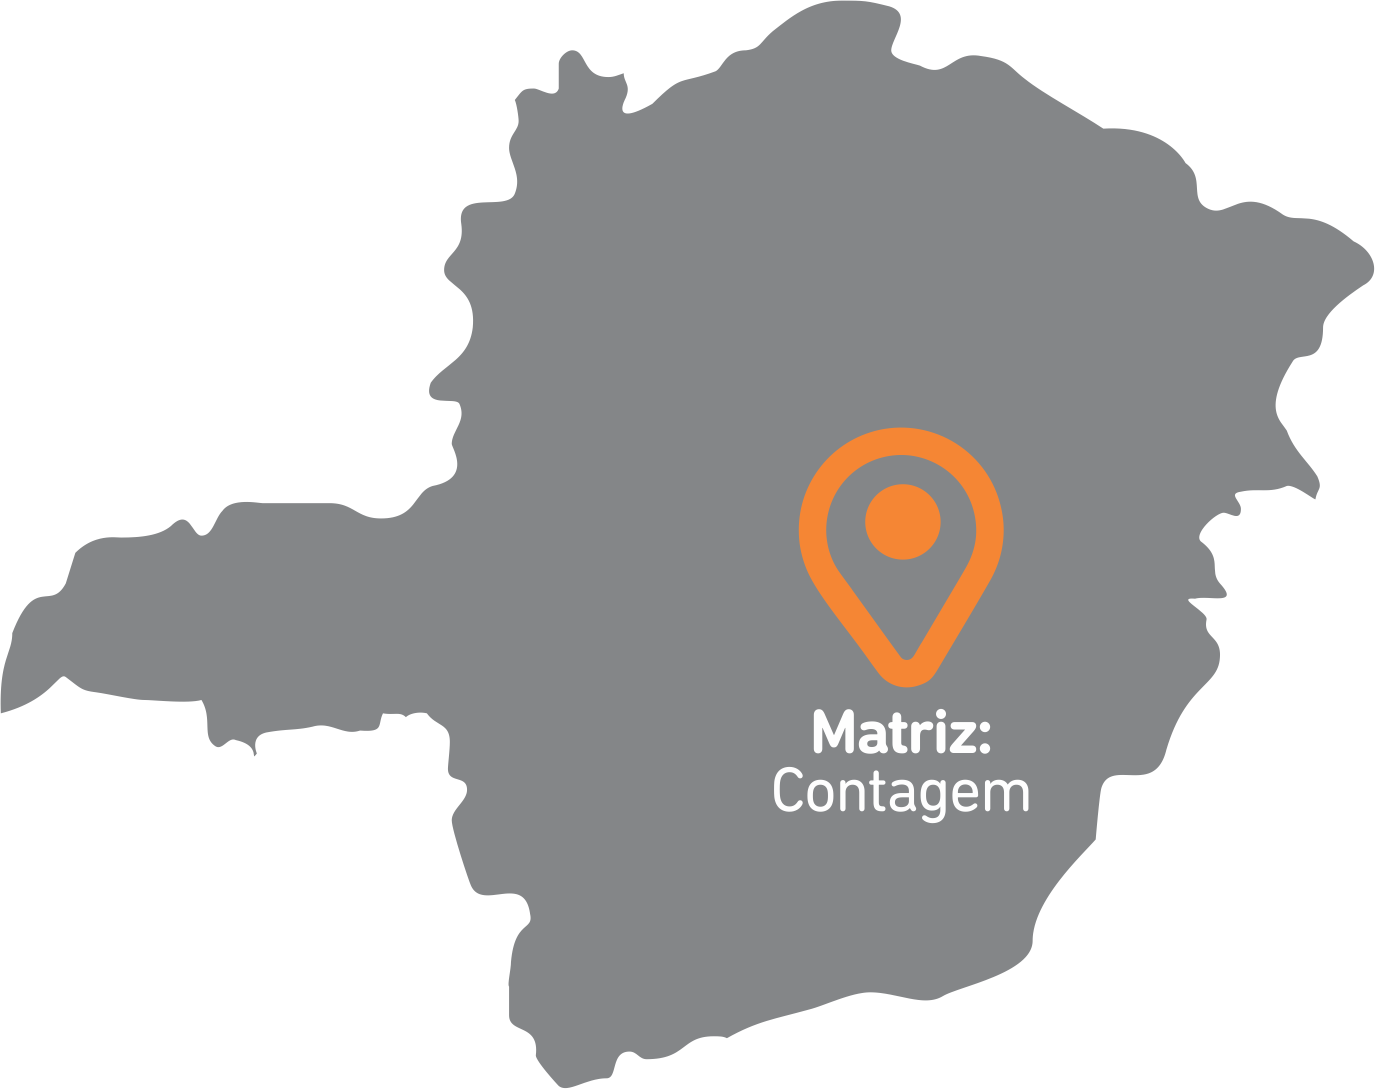 mapa mg - Sobre a Global